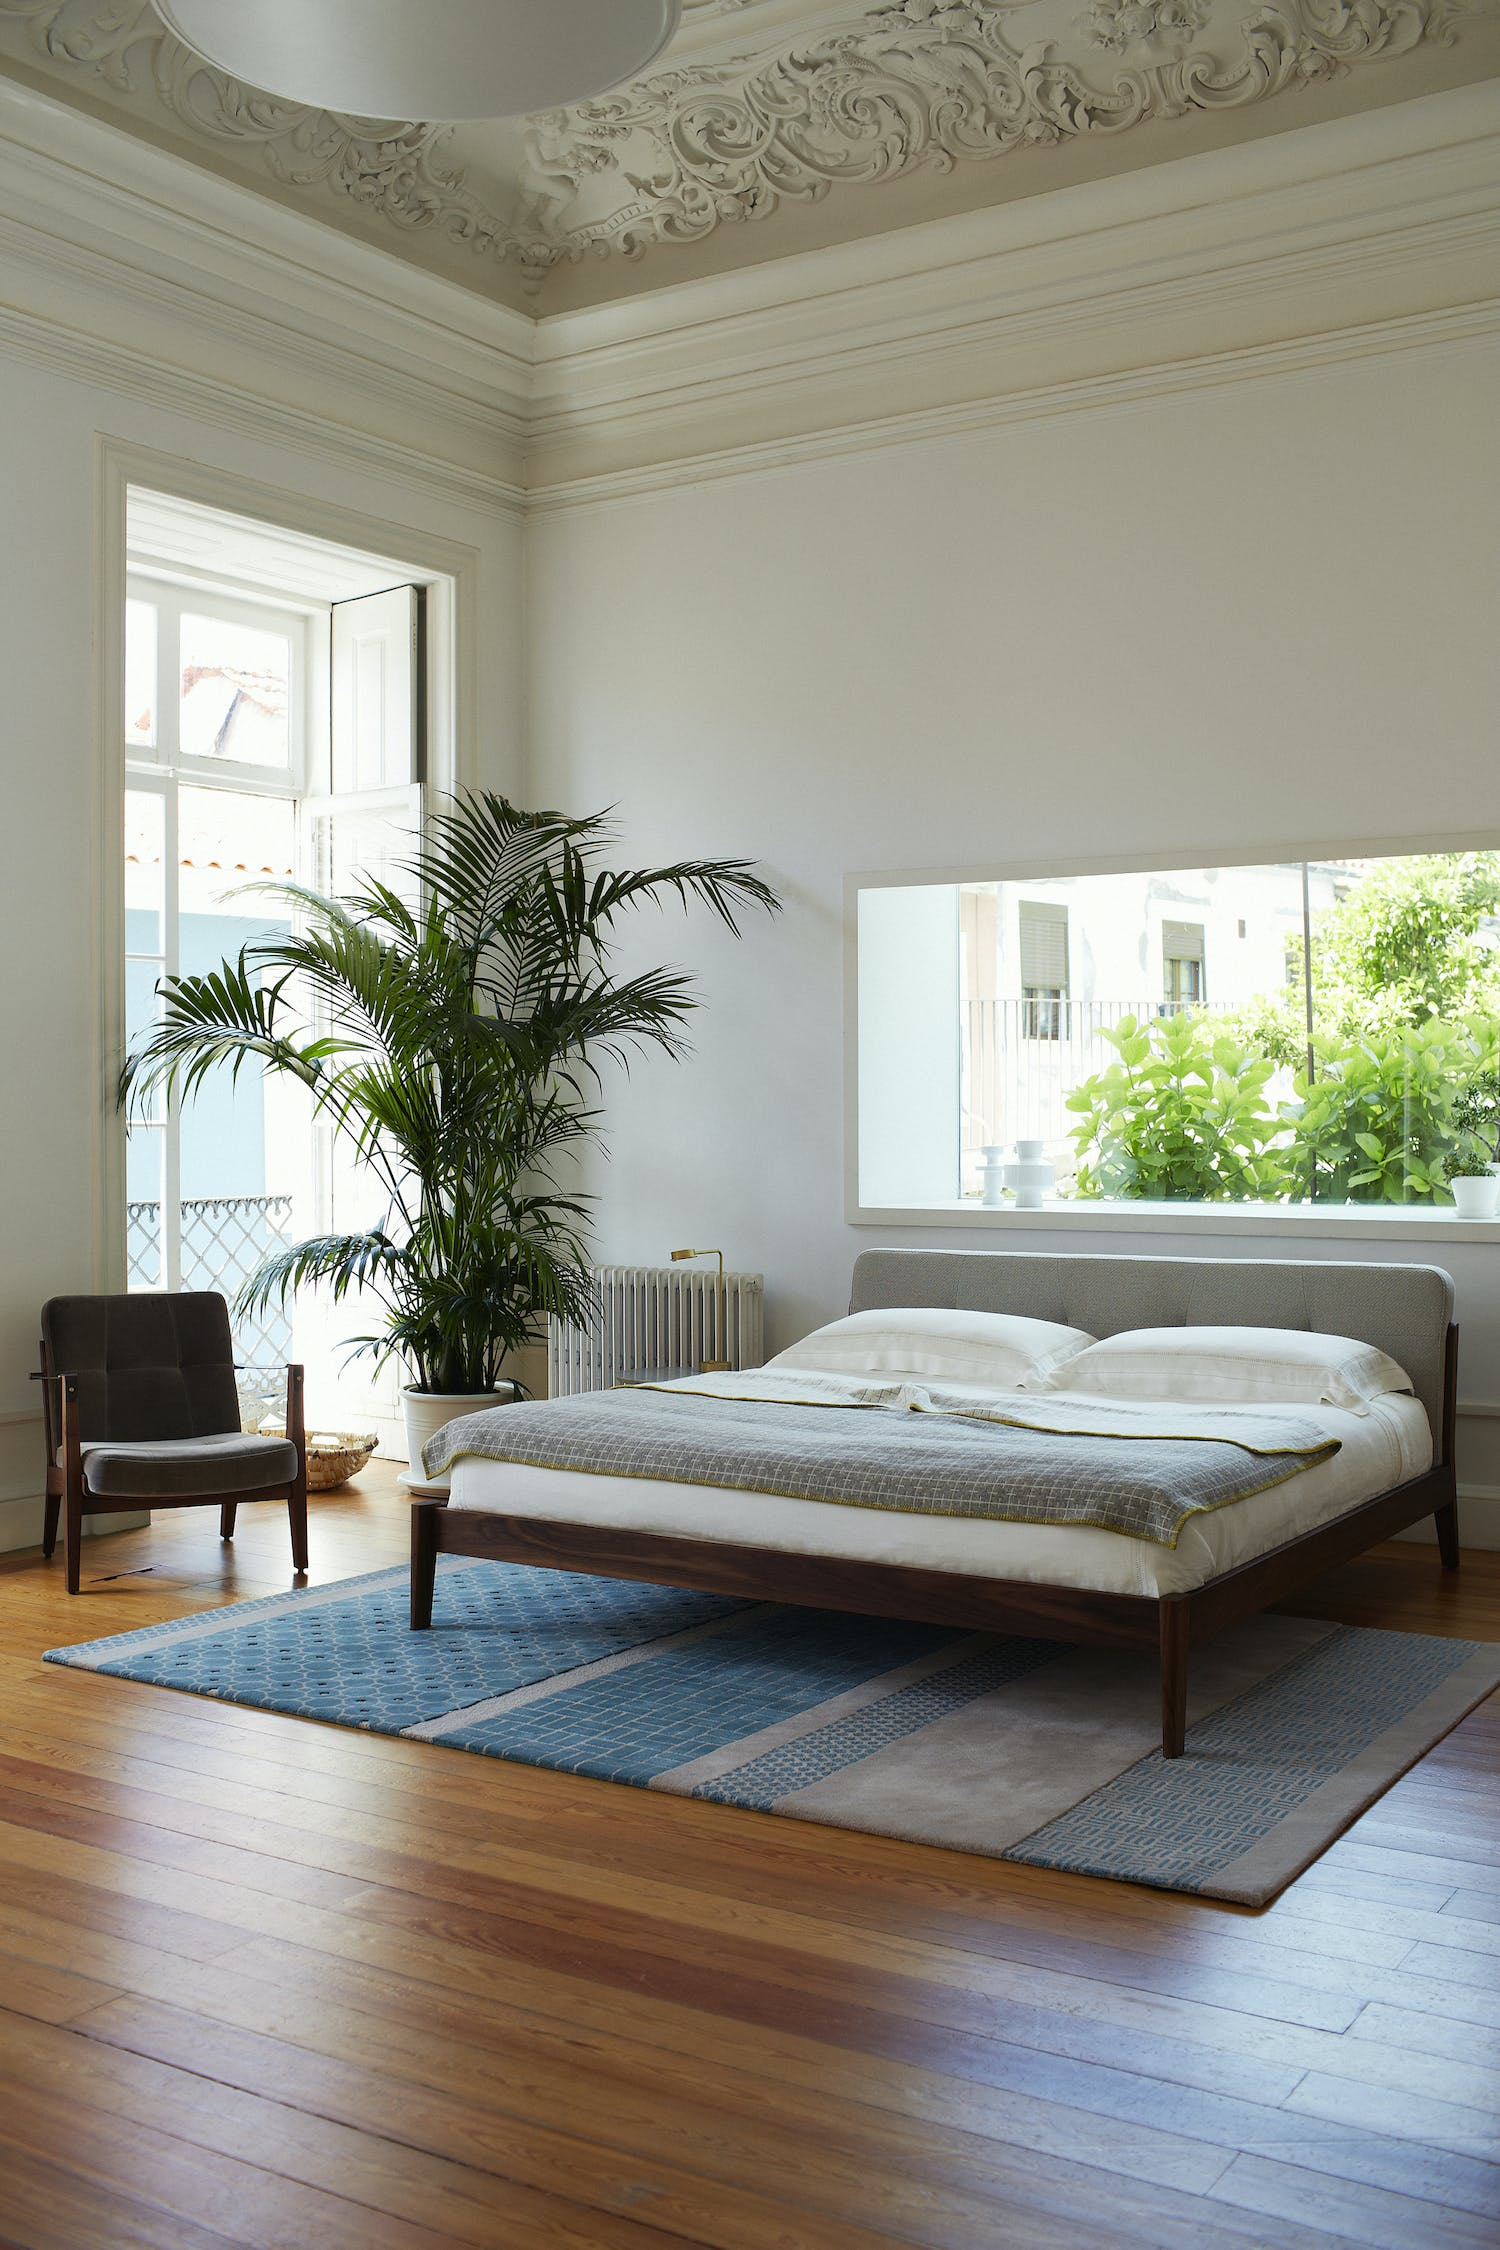 Capo Bed And Capo Lounge Armchair By Neri Hu Photo Yuki Sugiura Copy